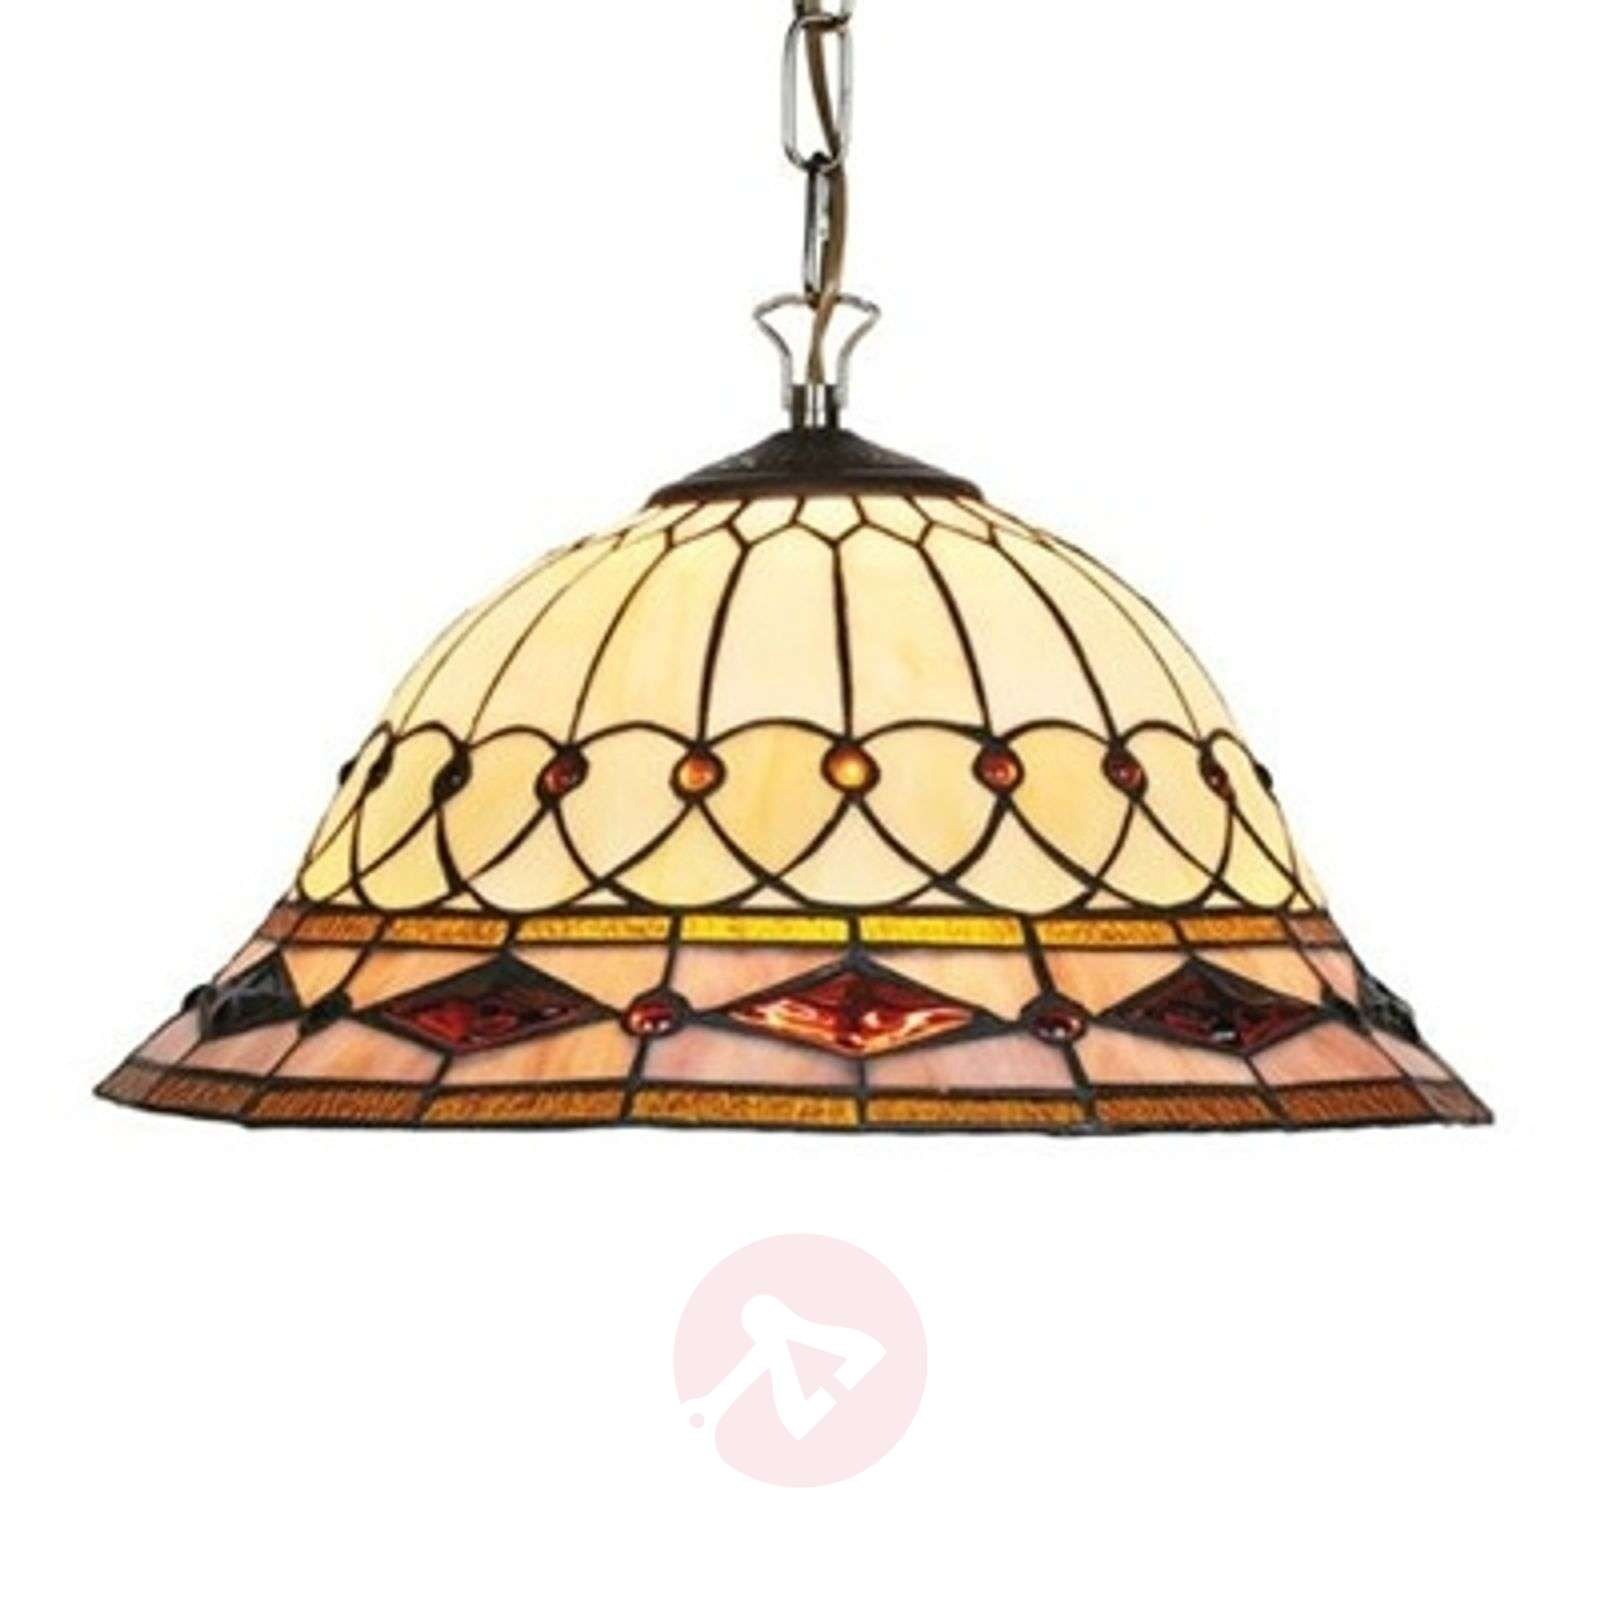 Hanging light Cassandra, Tiffany-style, 1-bulb-1032112-01